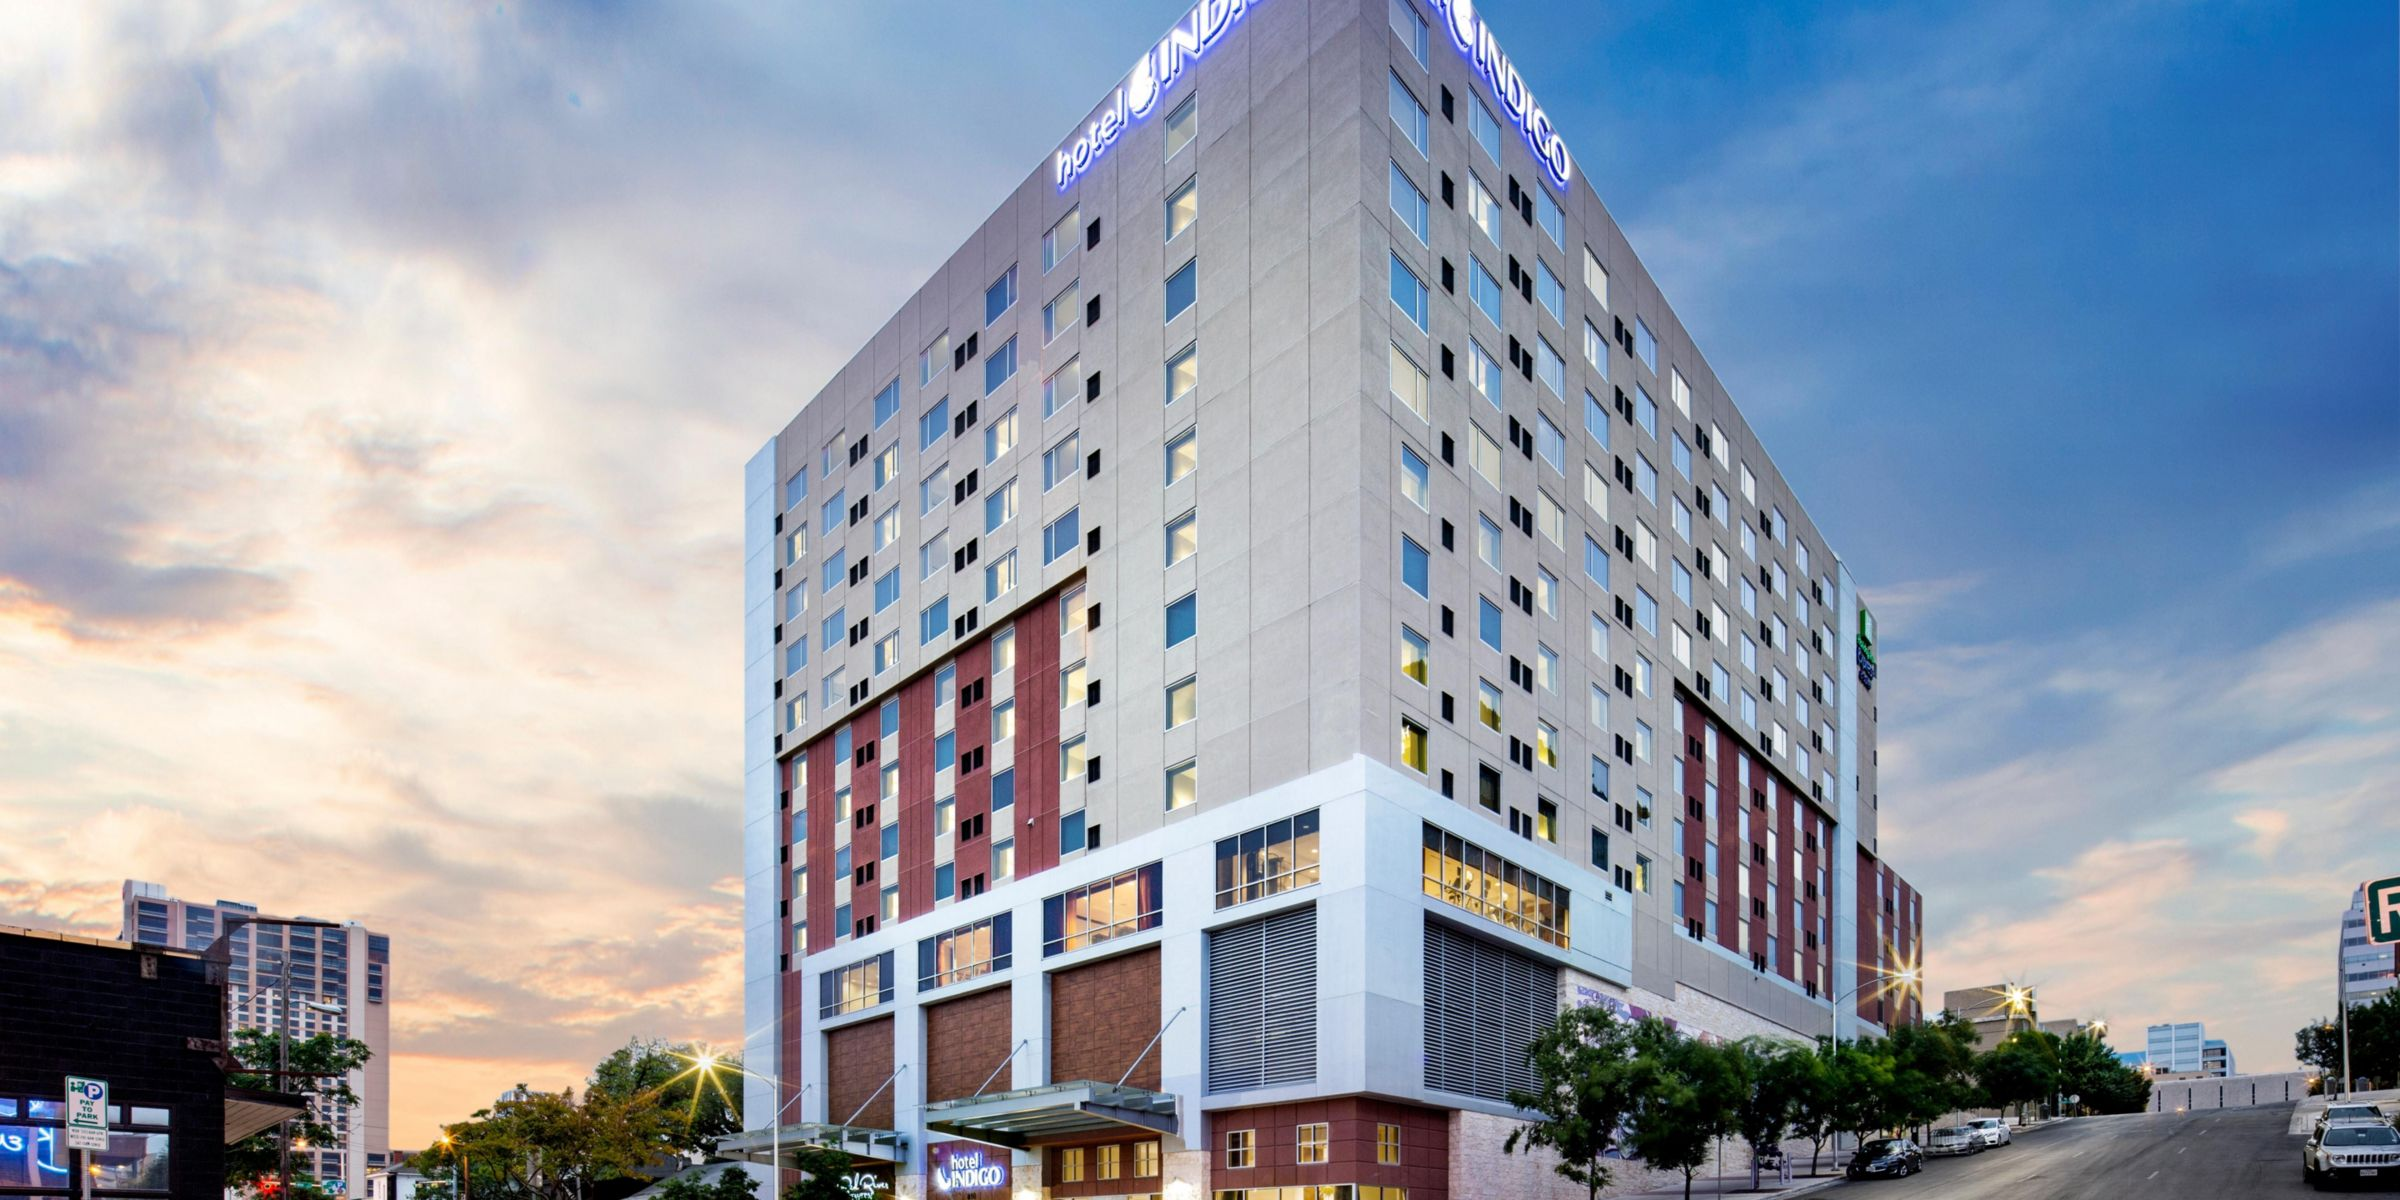 Austin Hotel: Hotel Indigo Austin, TX Downtown - University Hotel